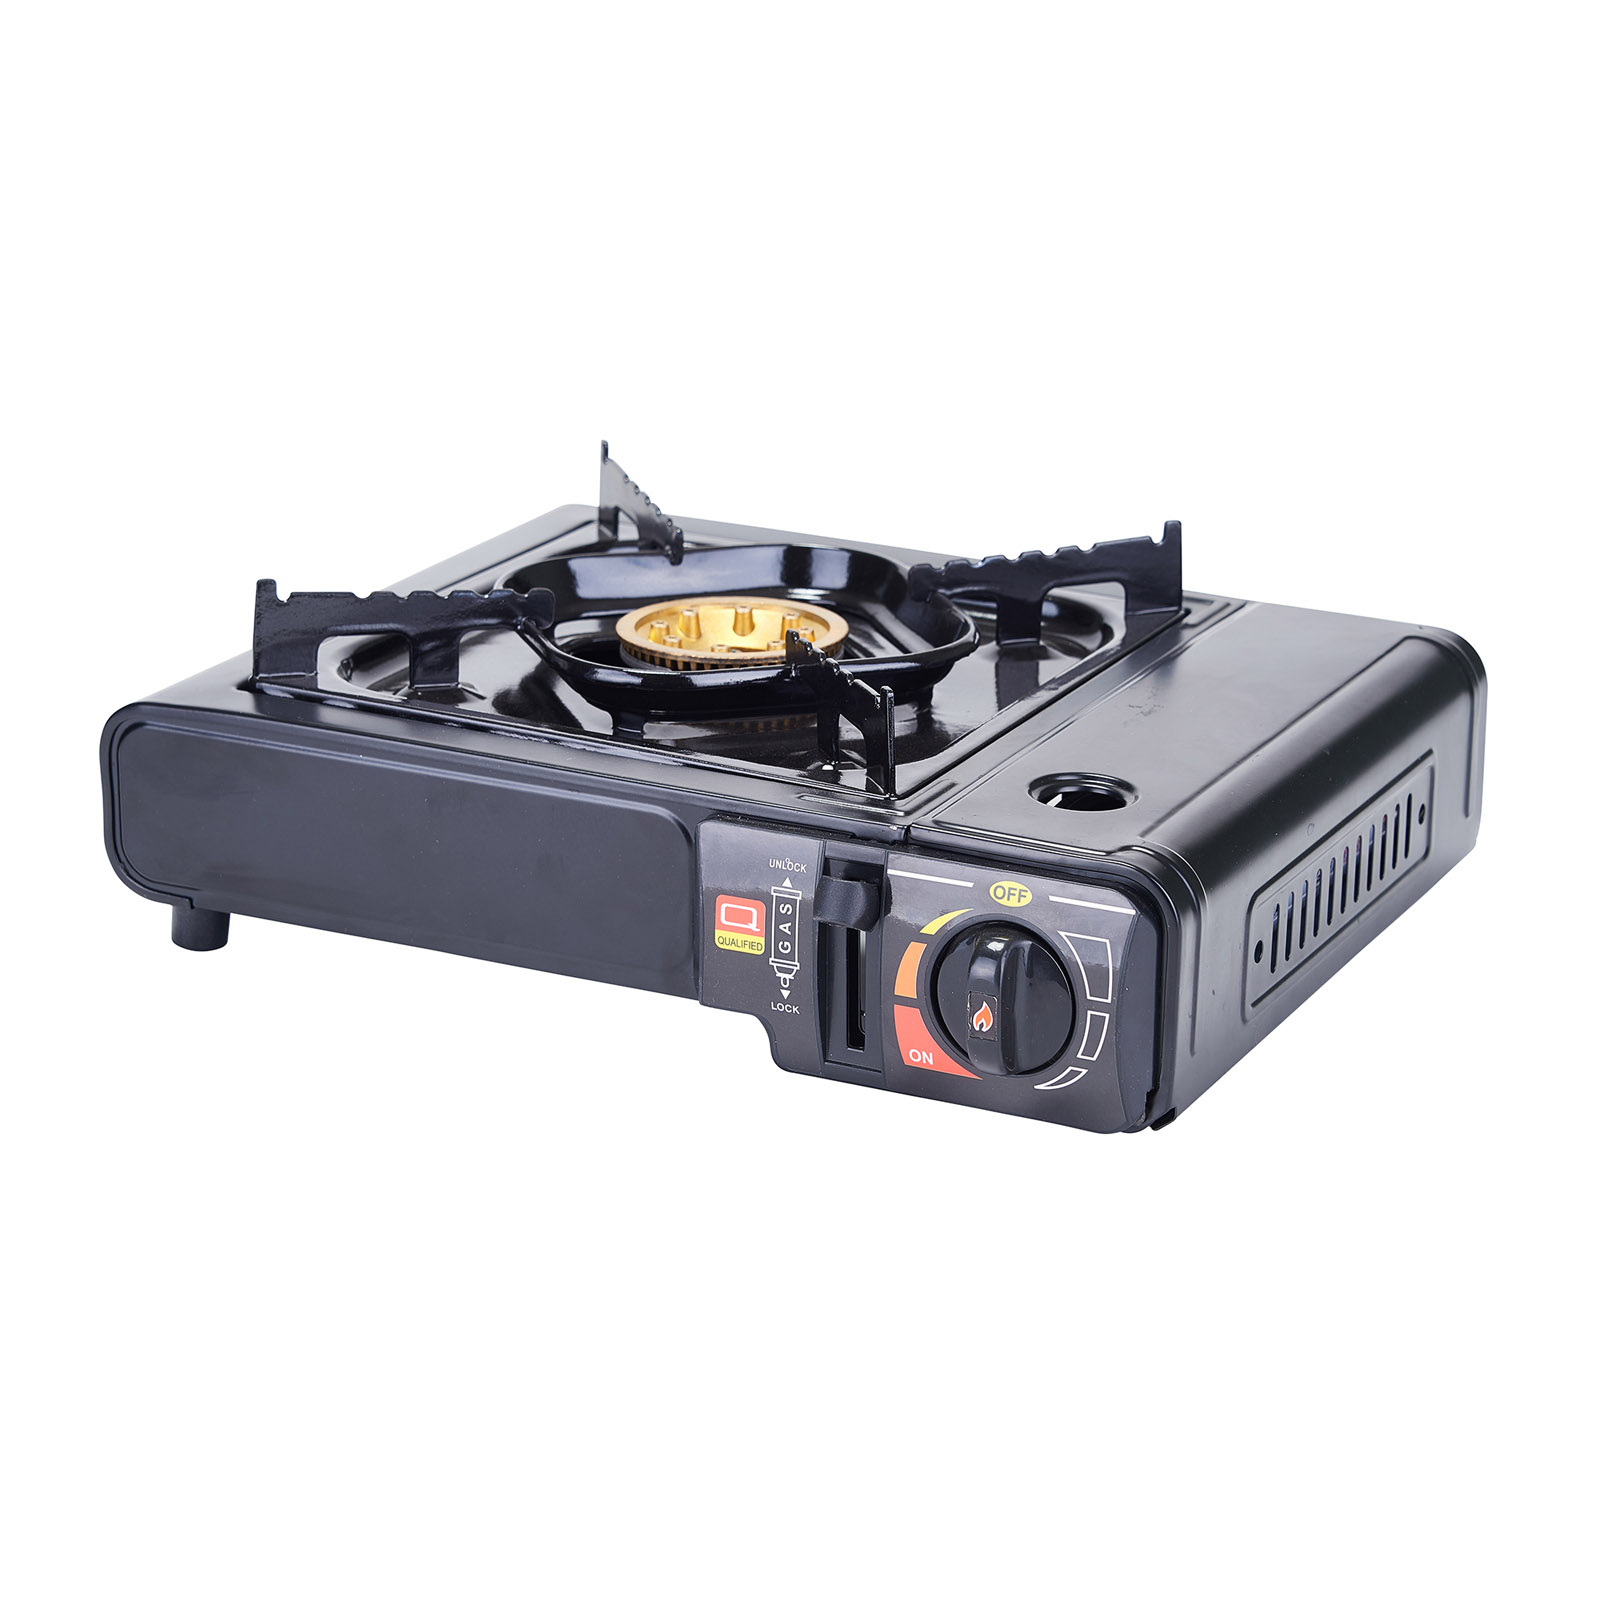 Winco PGS-1K butane stove